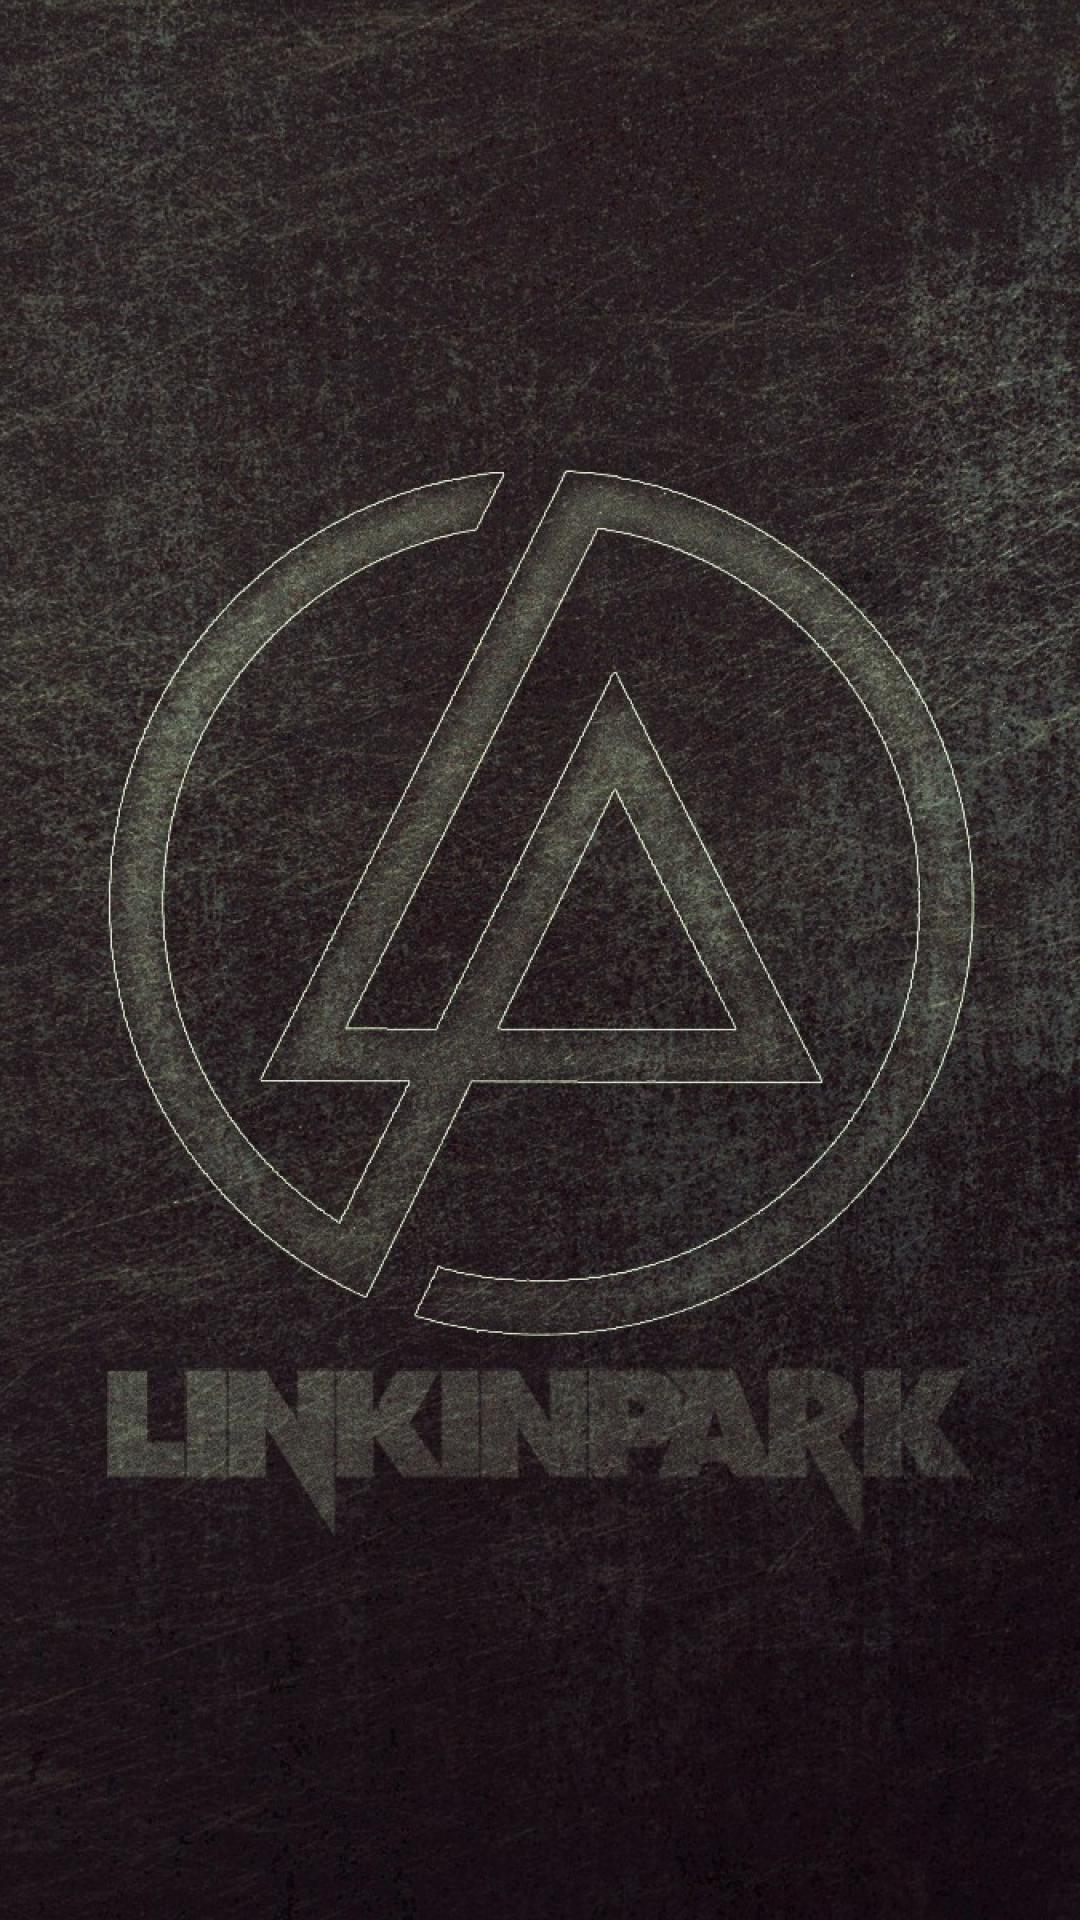 Linkin Park Hd Wallpapers Wallpaper Cave